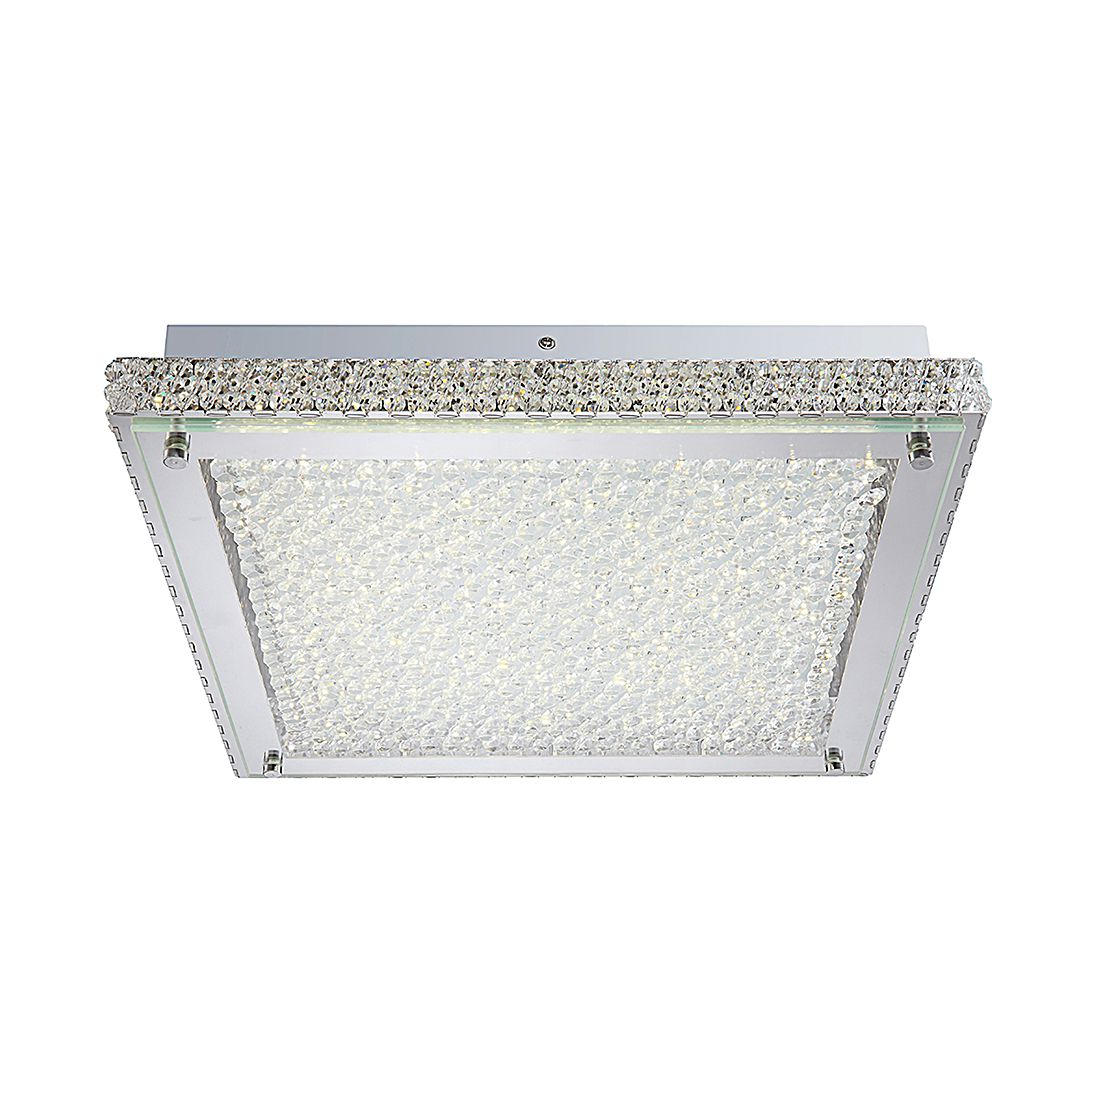 Lampada da soffitto Krystal III, Globo Lighting